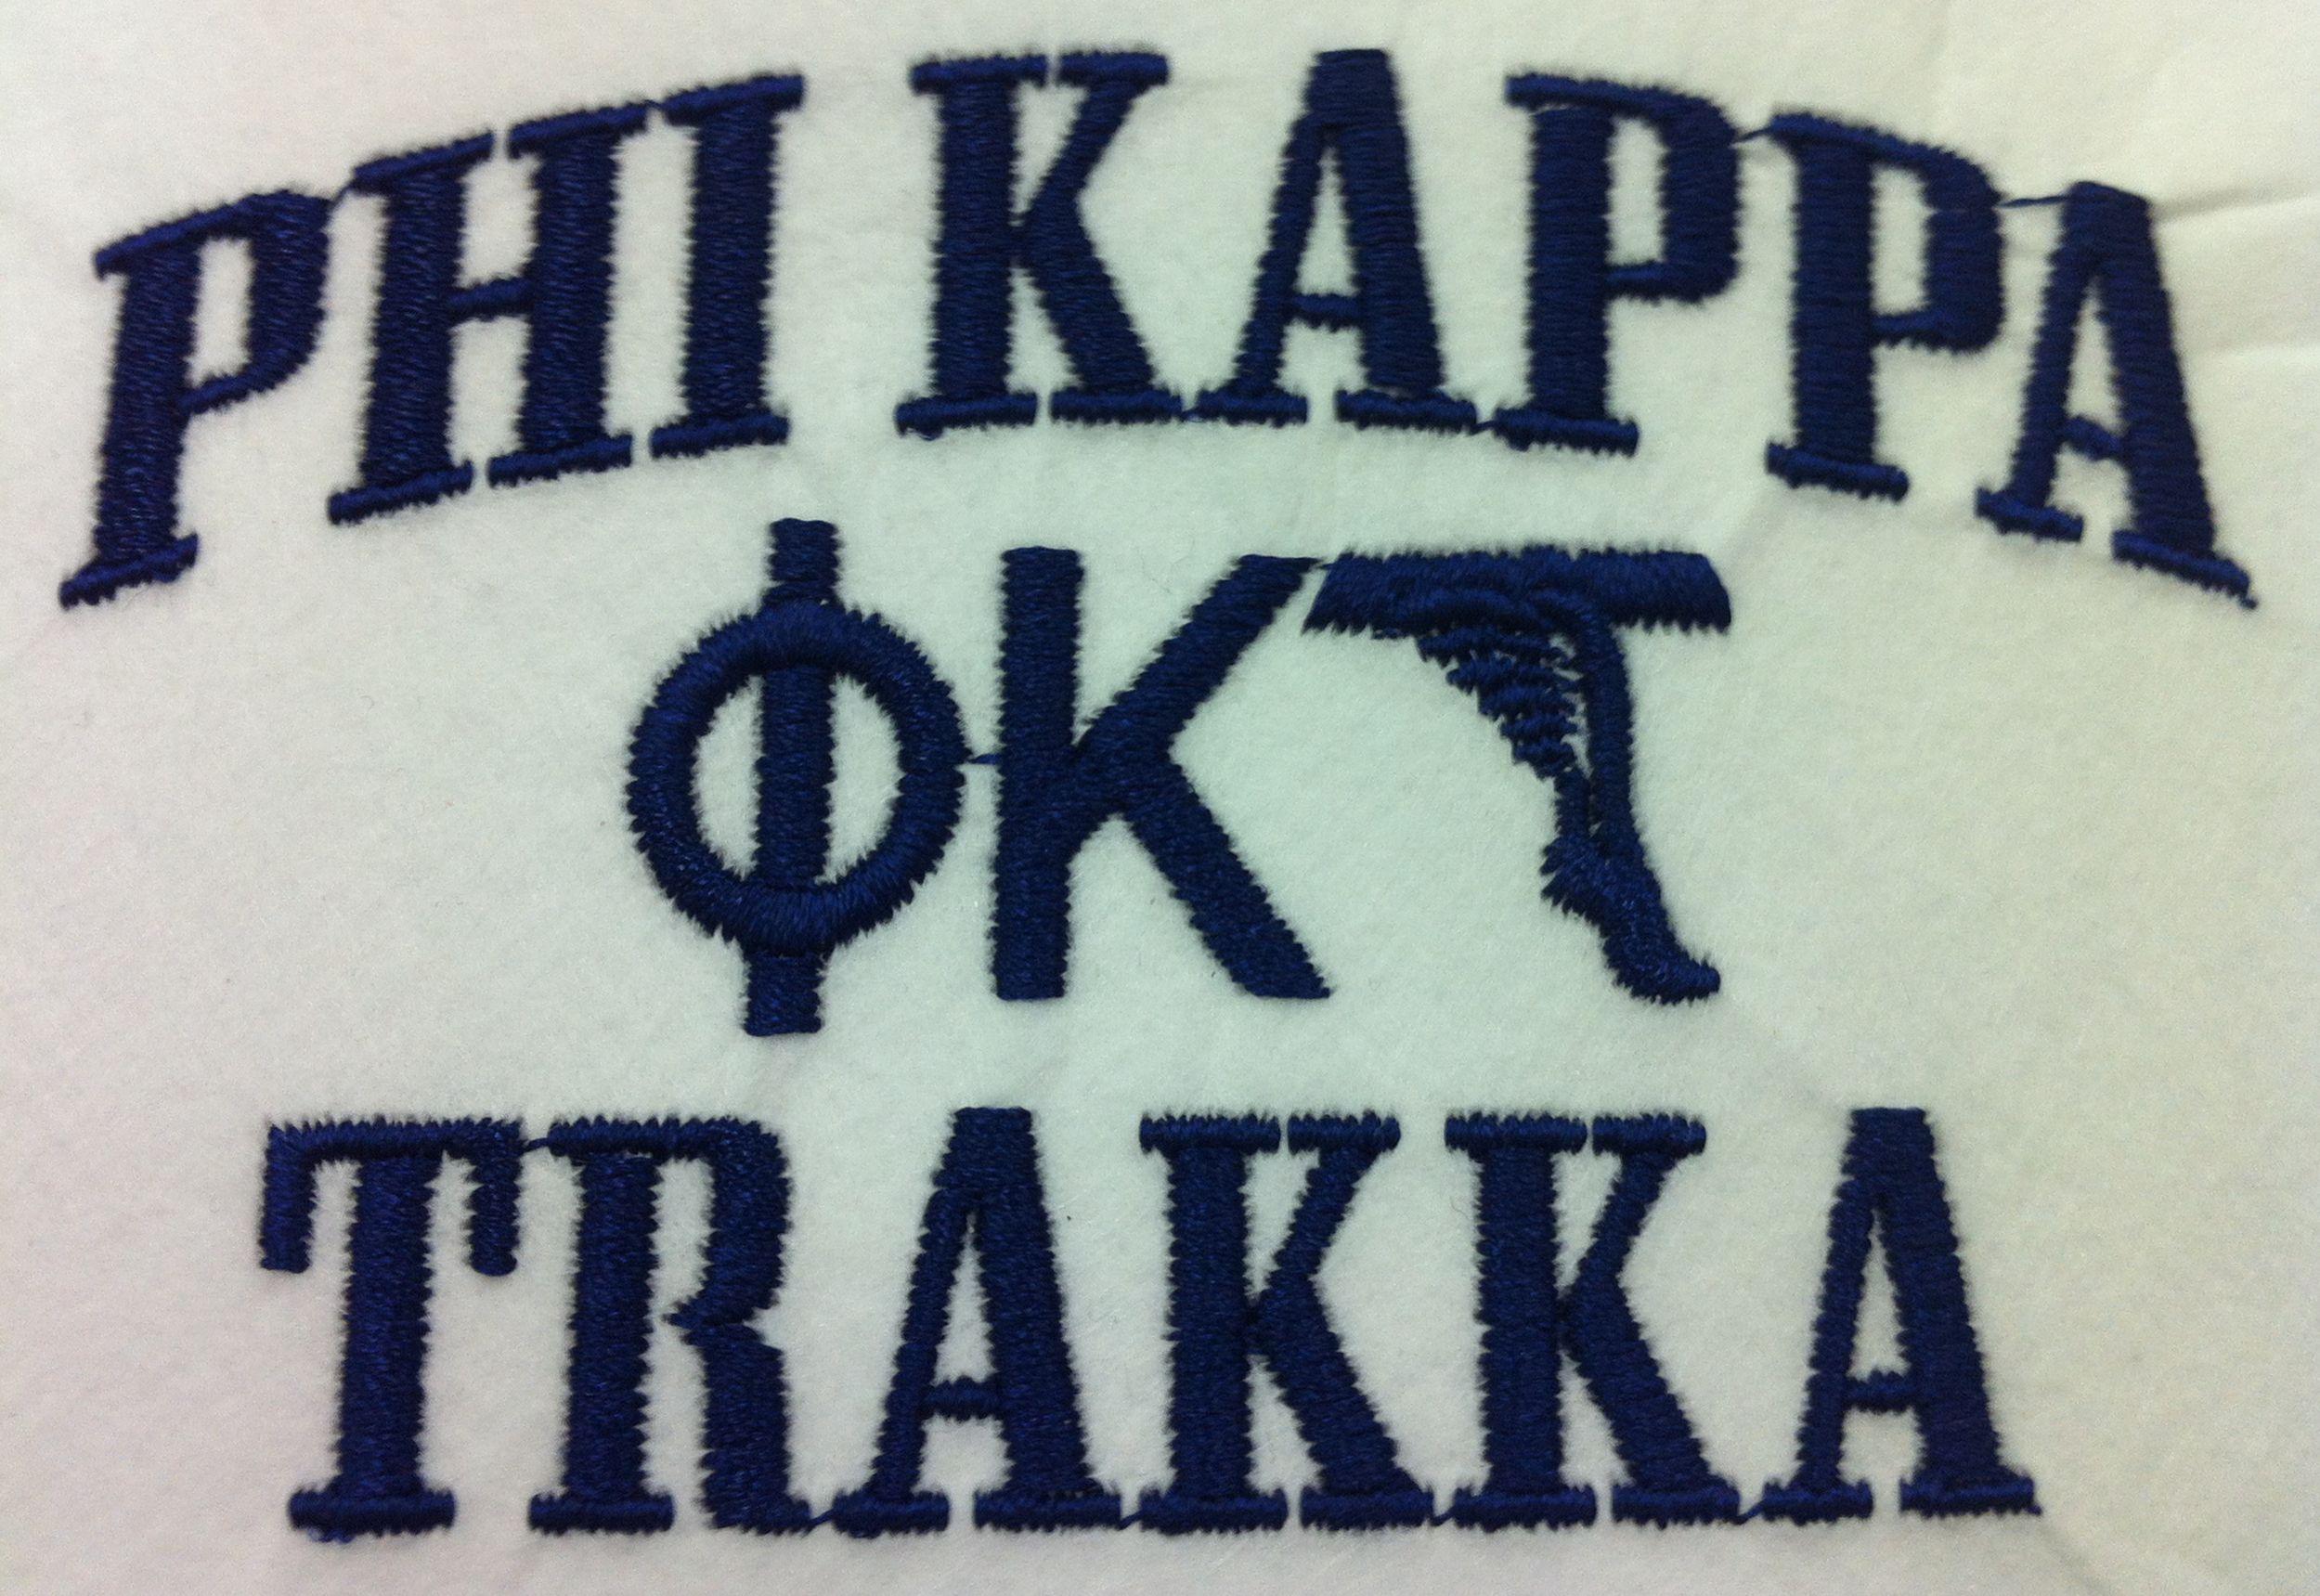 Phi Kappa Trakka